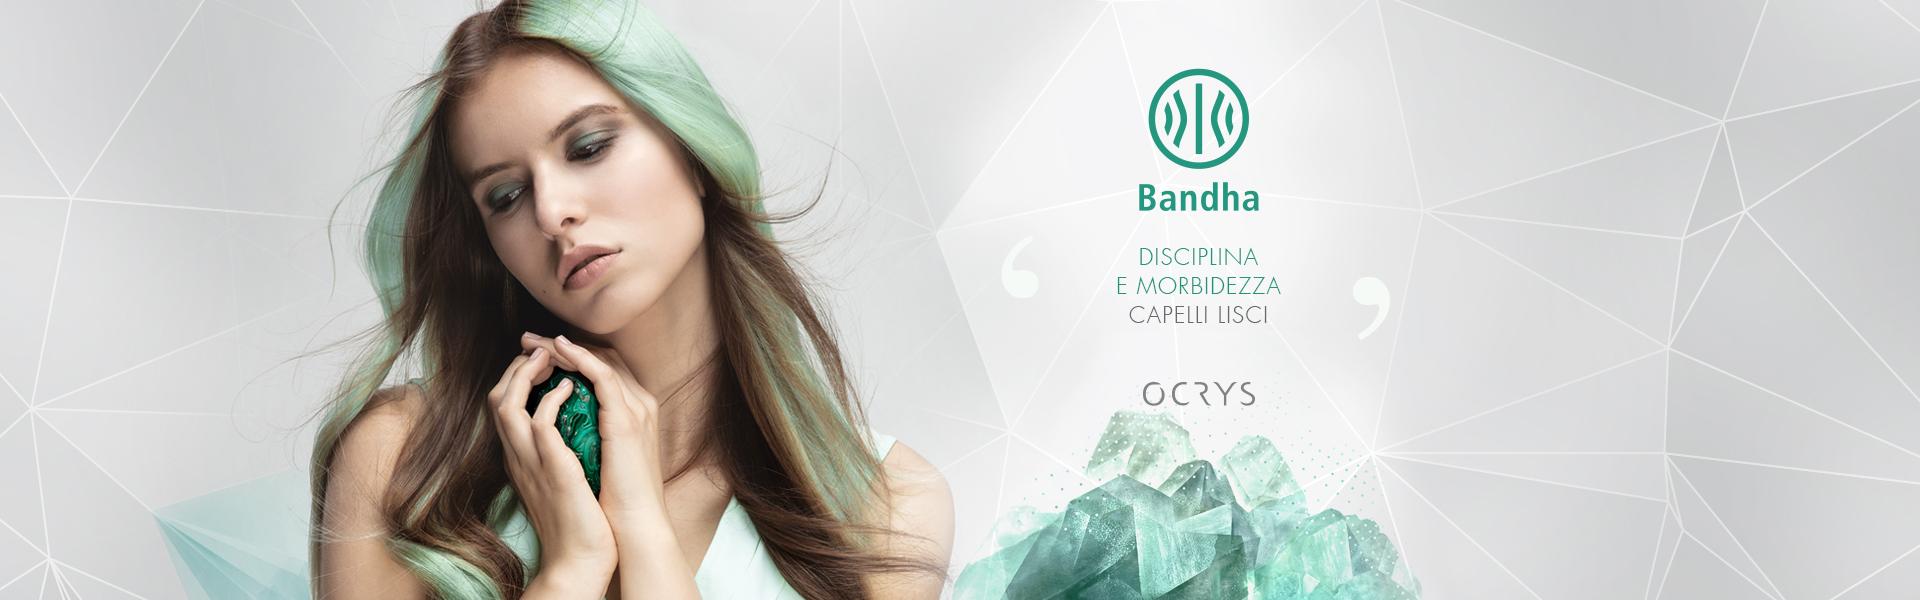 banner_centrali_BANDHA